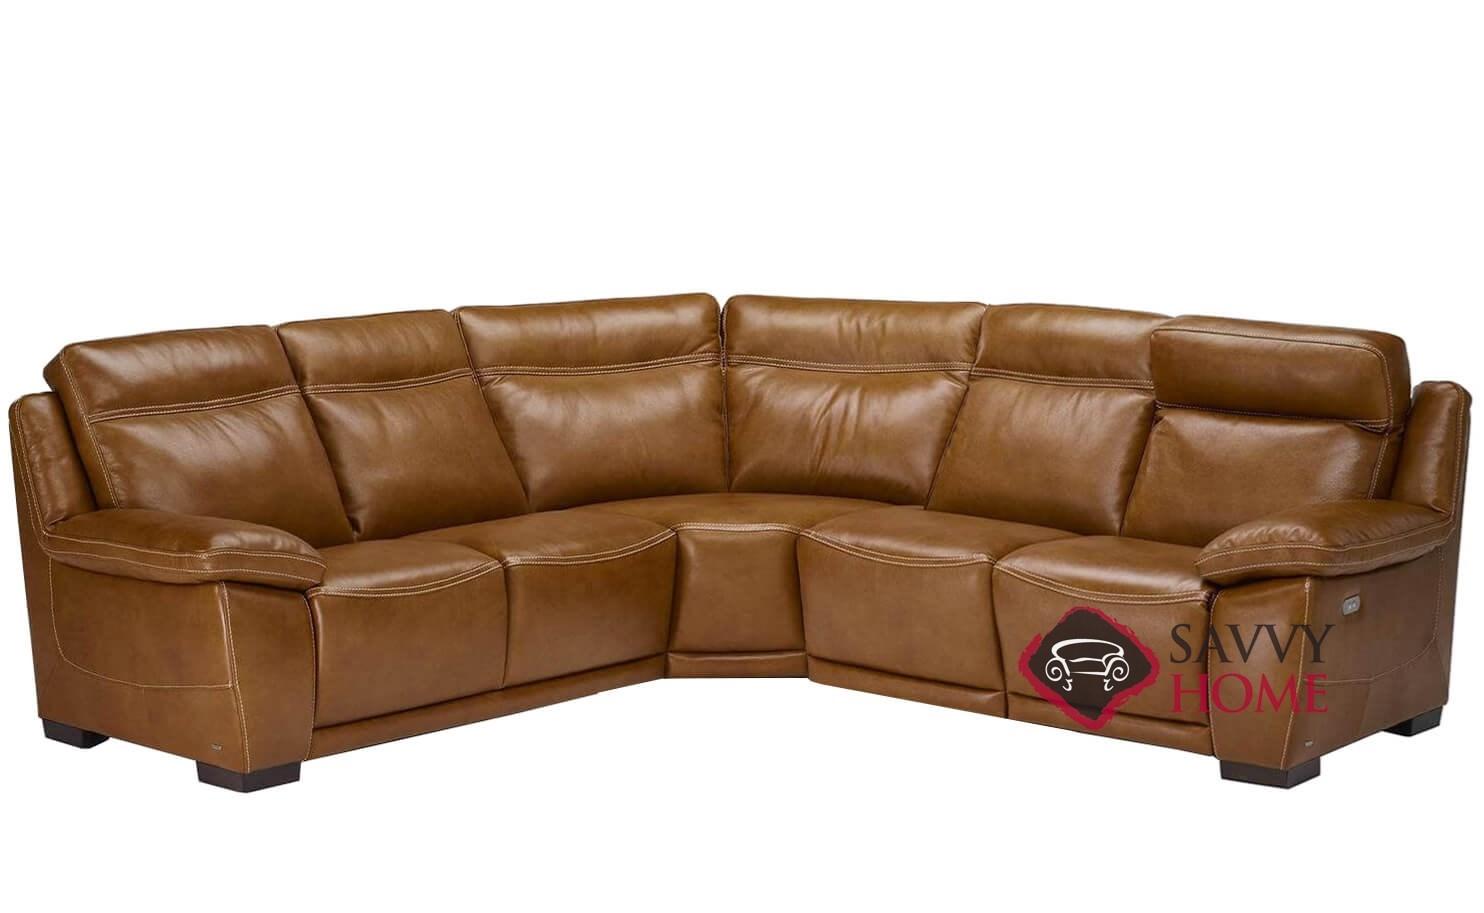 Ottimista (B875-182/029/183) Power Reclining Leather True Sectional Sofa by  Natuzzi